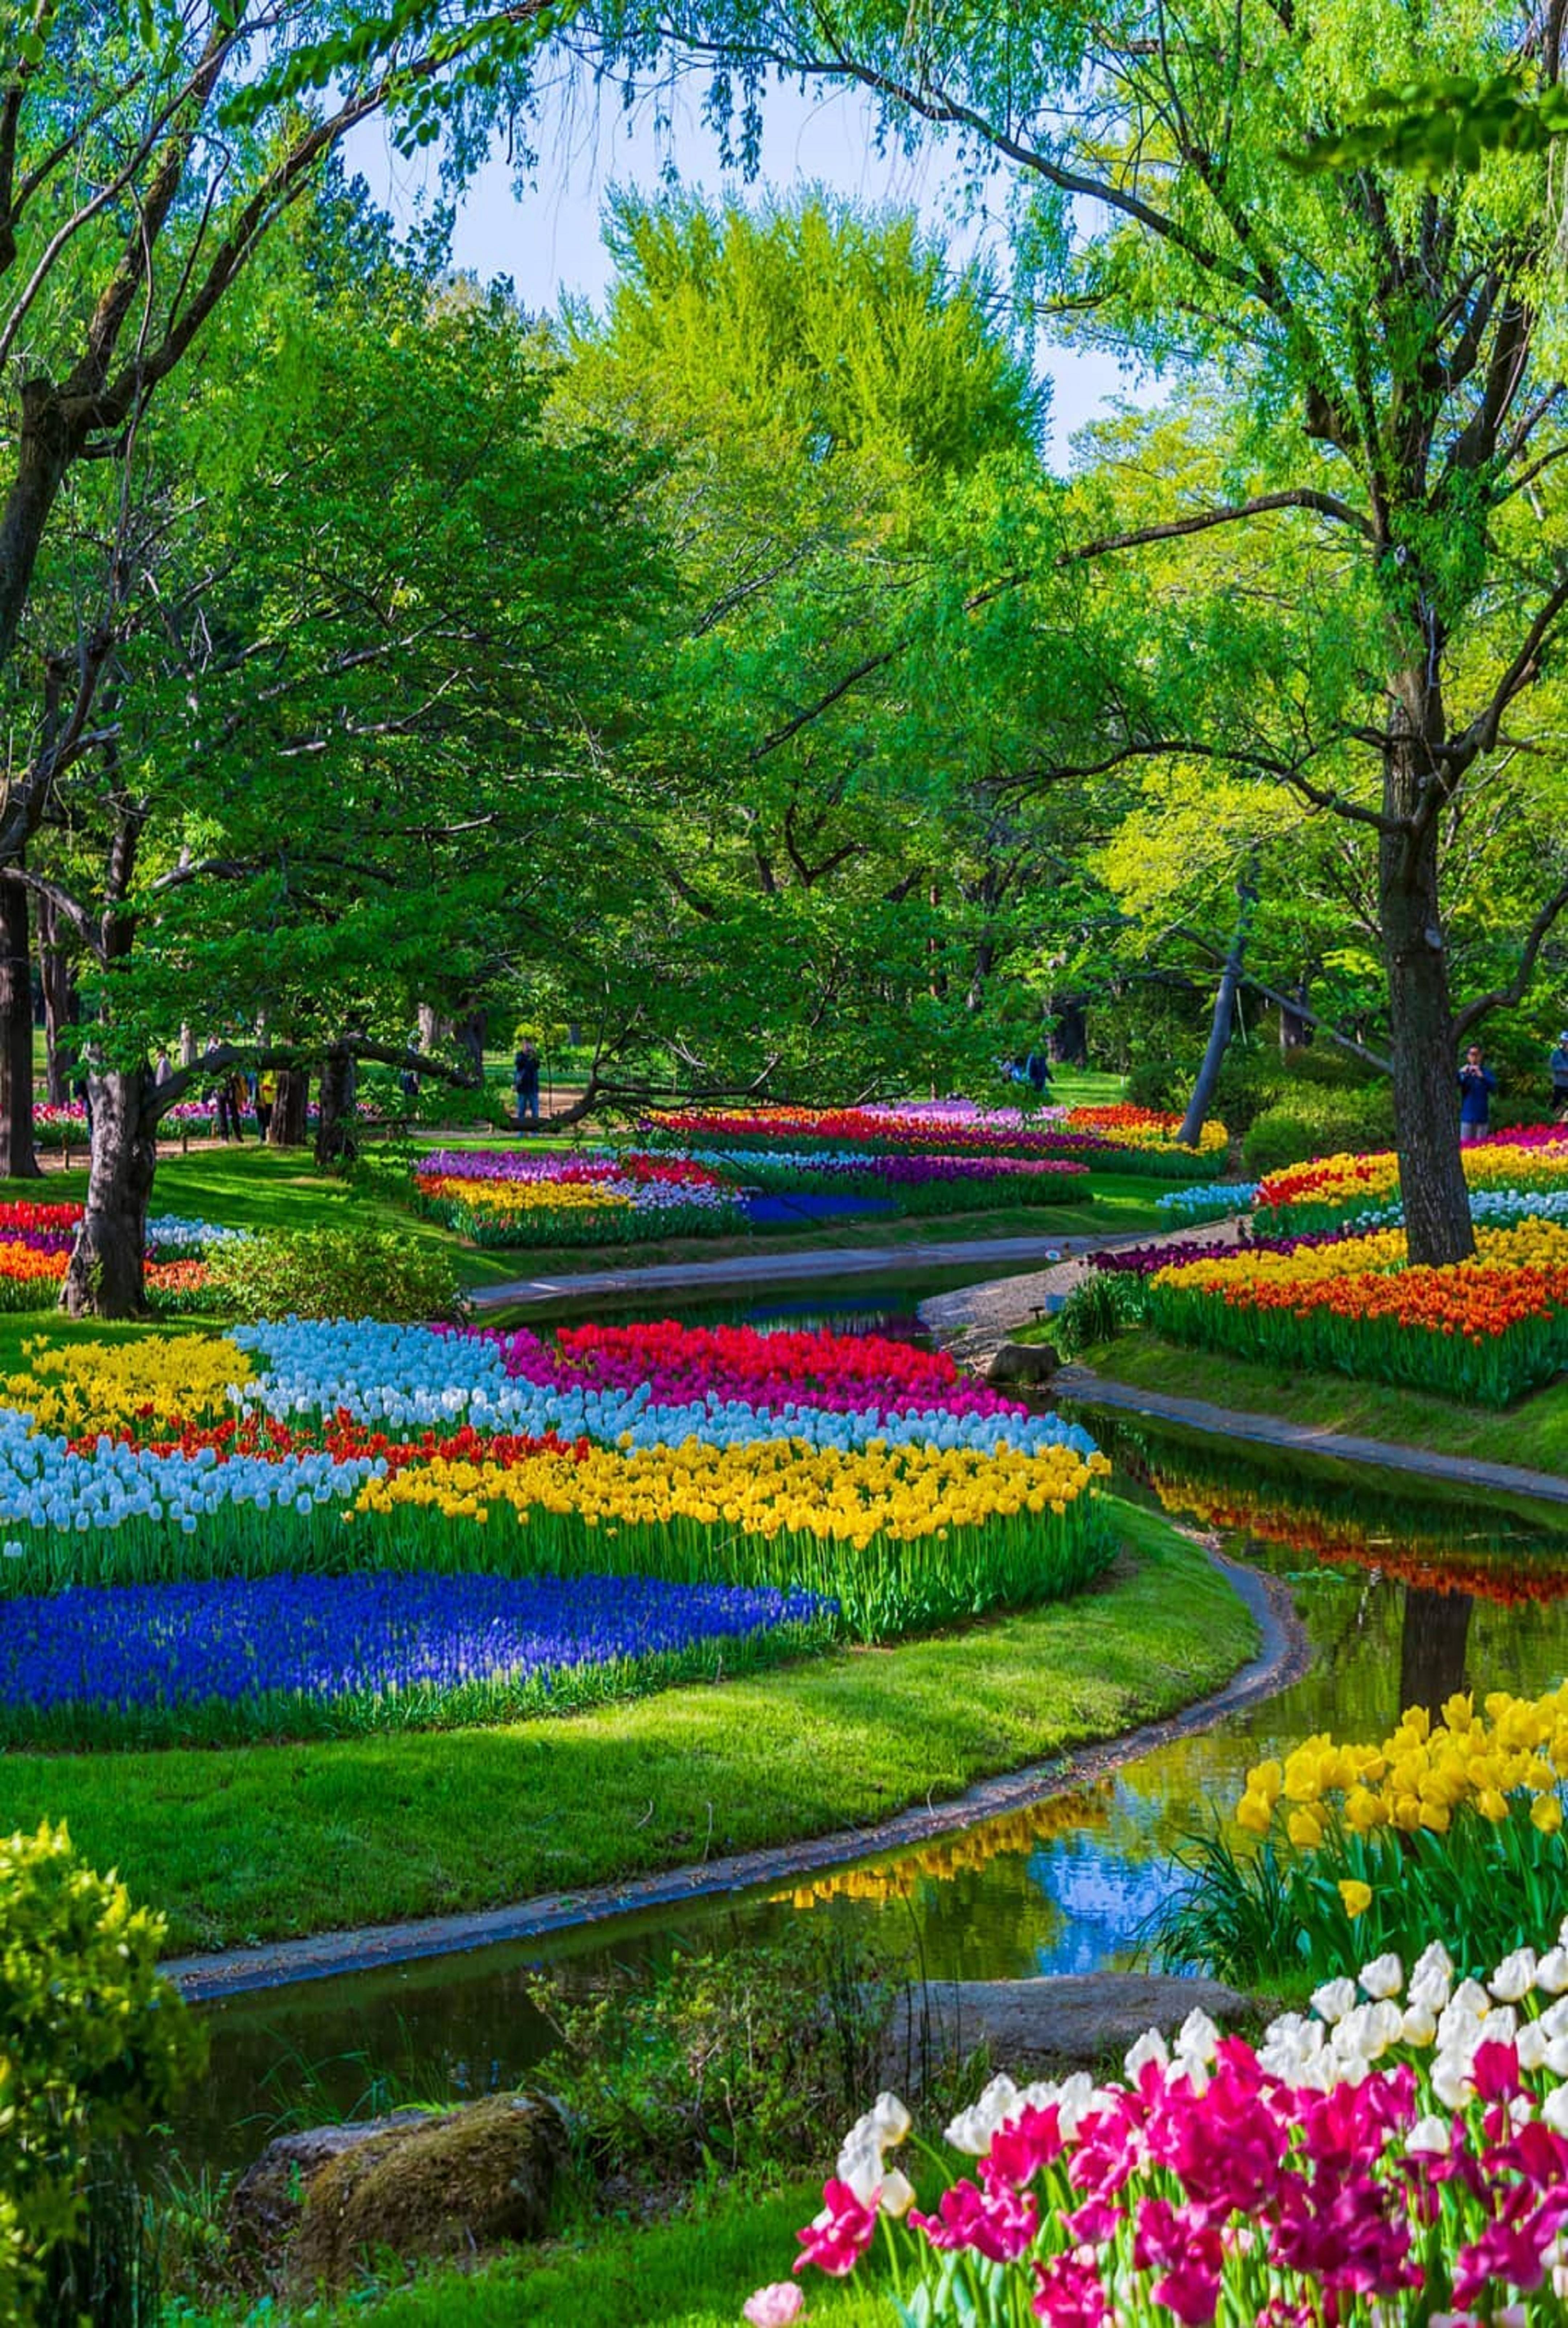 Pin By Ivanka Kostova On Vsichko Beautiful Gardens Most Beautiful Gardens Beautiful Nature Wallpaper